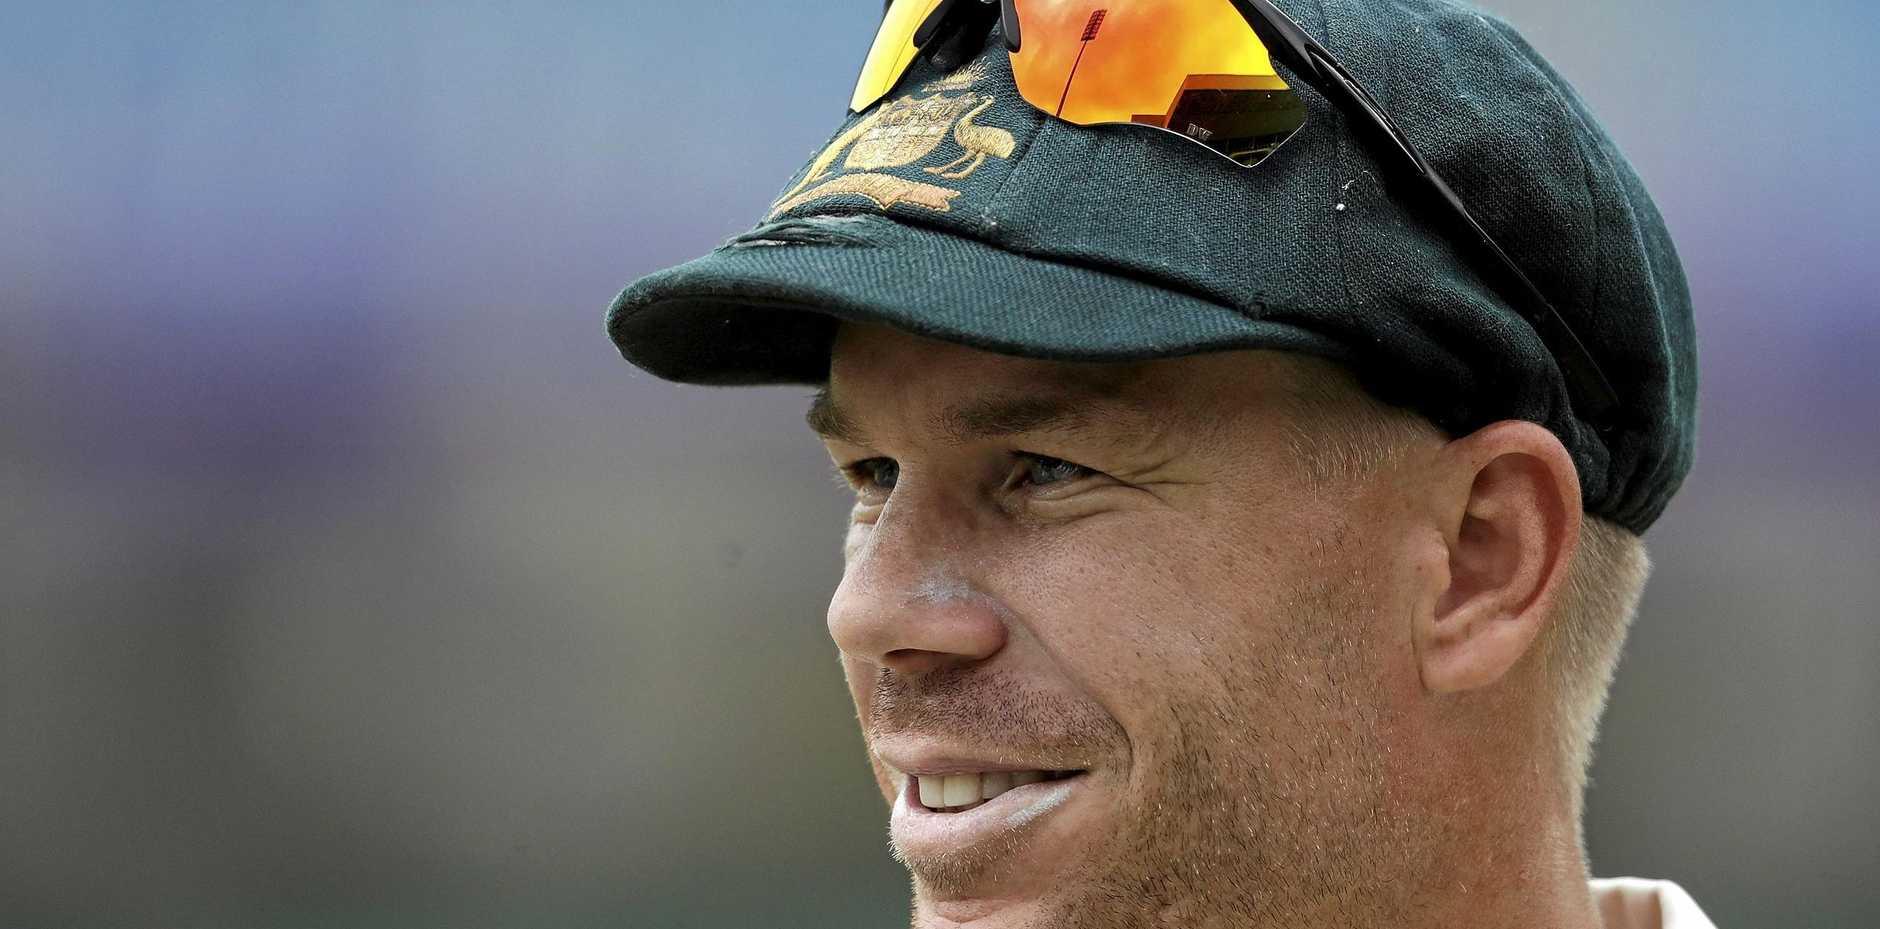 HAPPIER TIMES: Former Australian vice captain David Warner during better times.